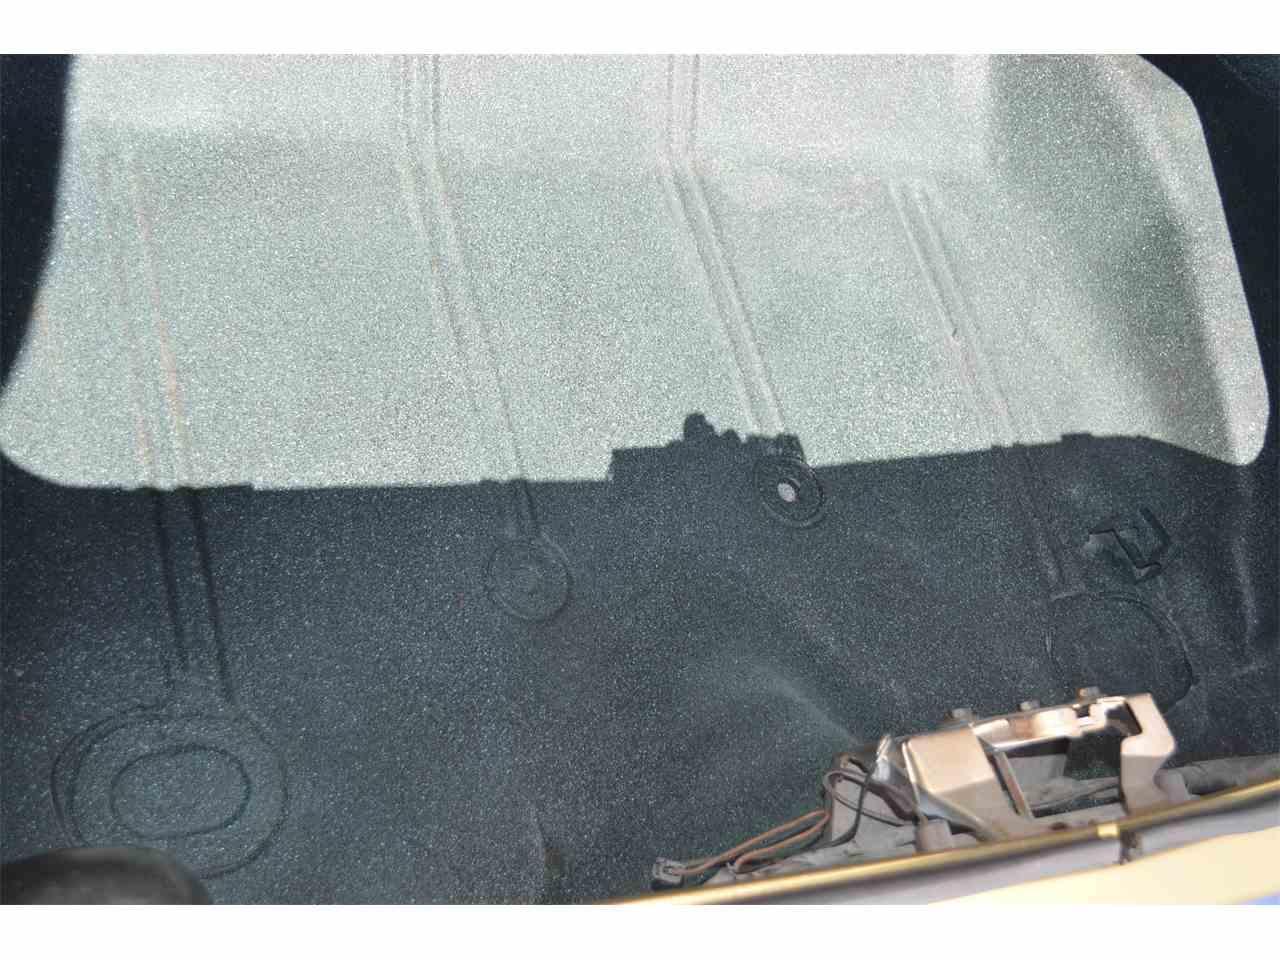 Large Picture of '70 Camaro located in Alabama - $27,900.00 - M517